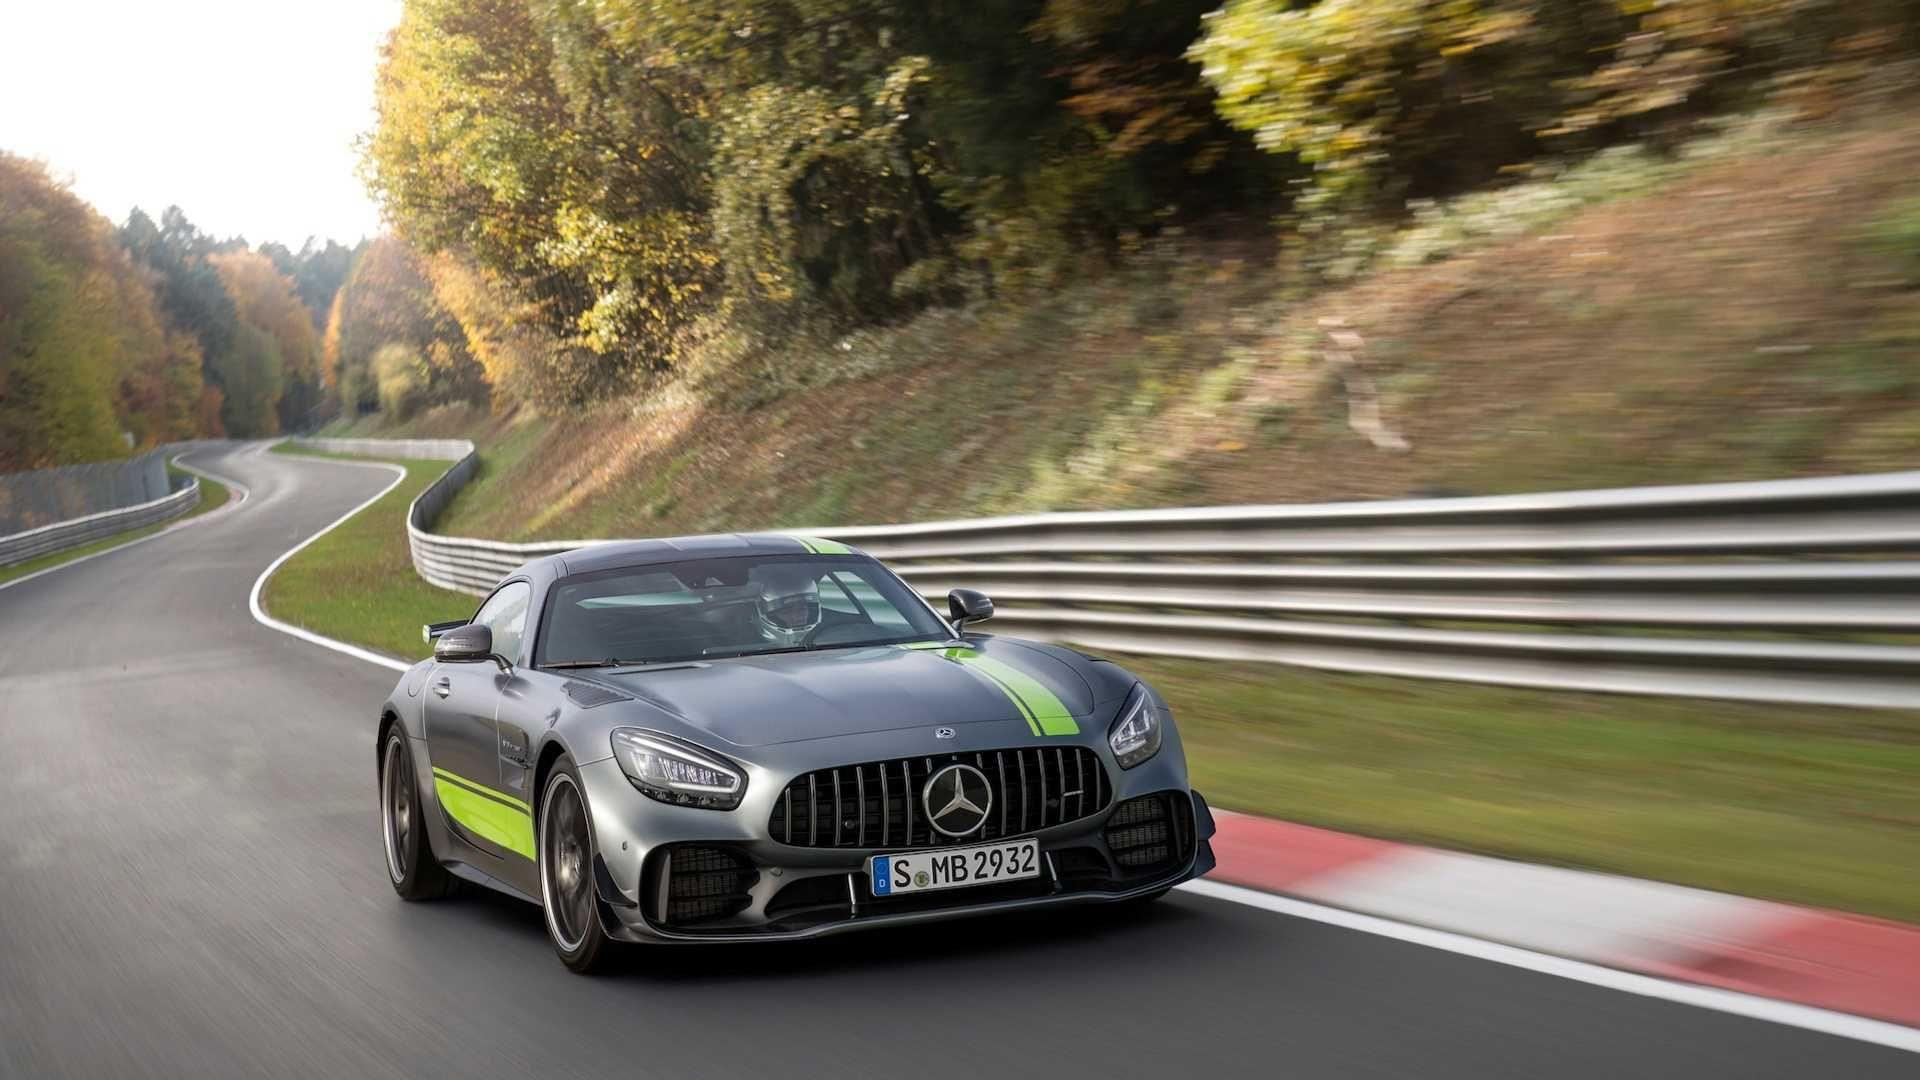 Mercedes-AMG ra mắt AMG GT R Pro tại Los Angeles Auto Show 2018 Ảnh 2